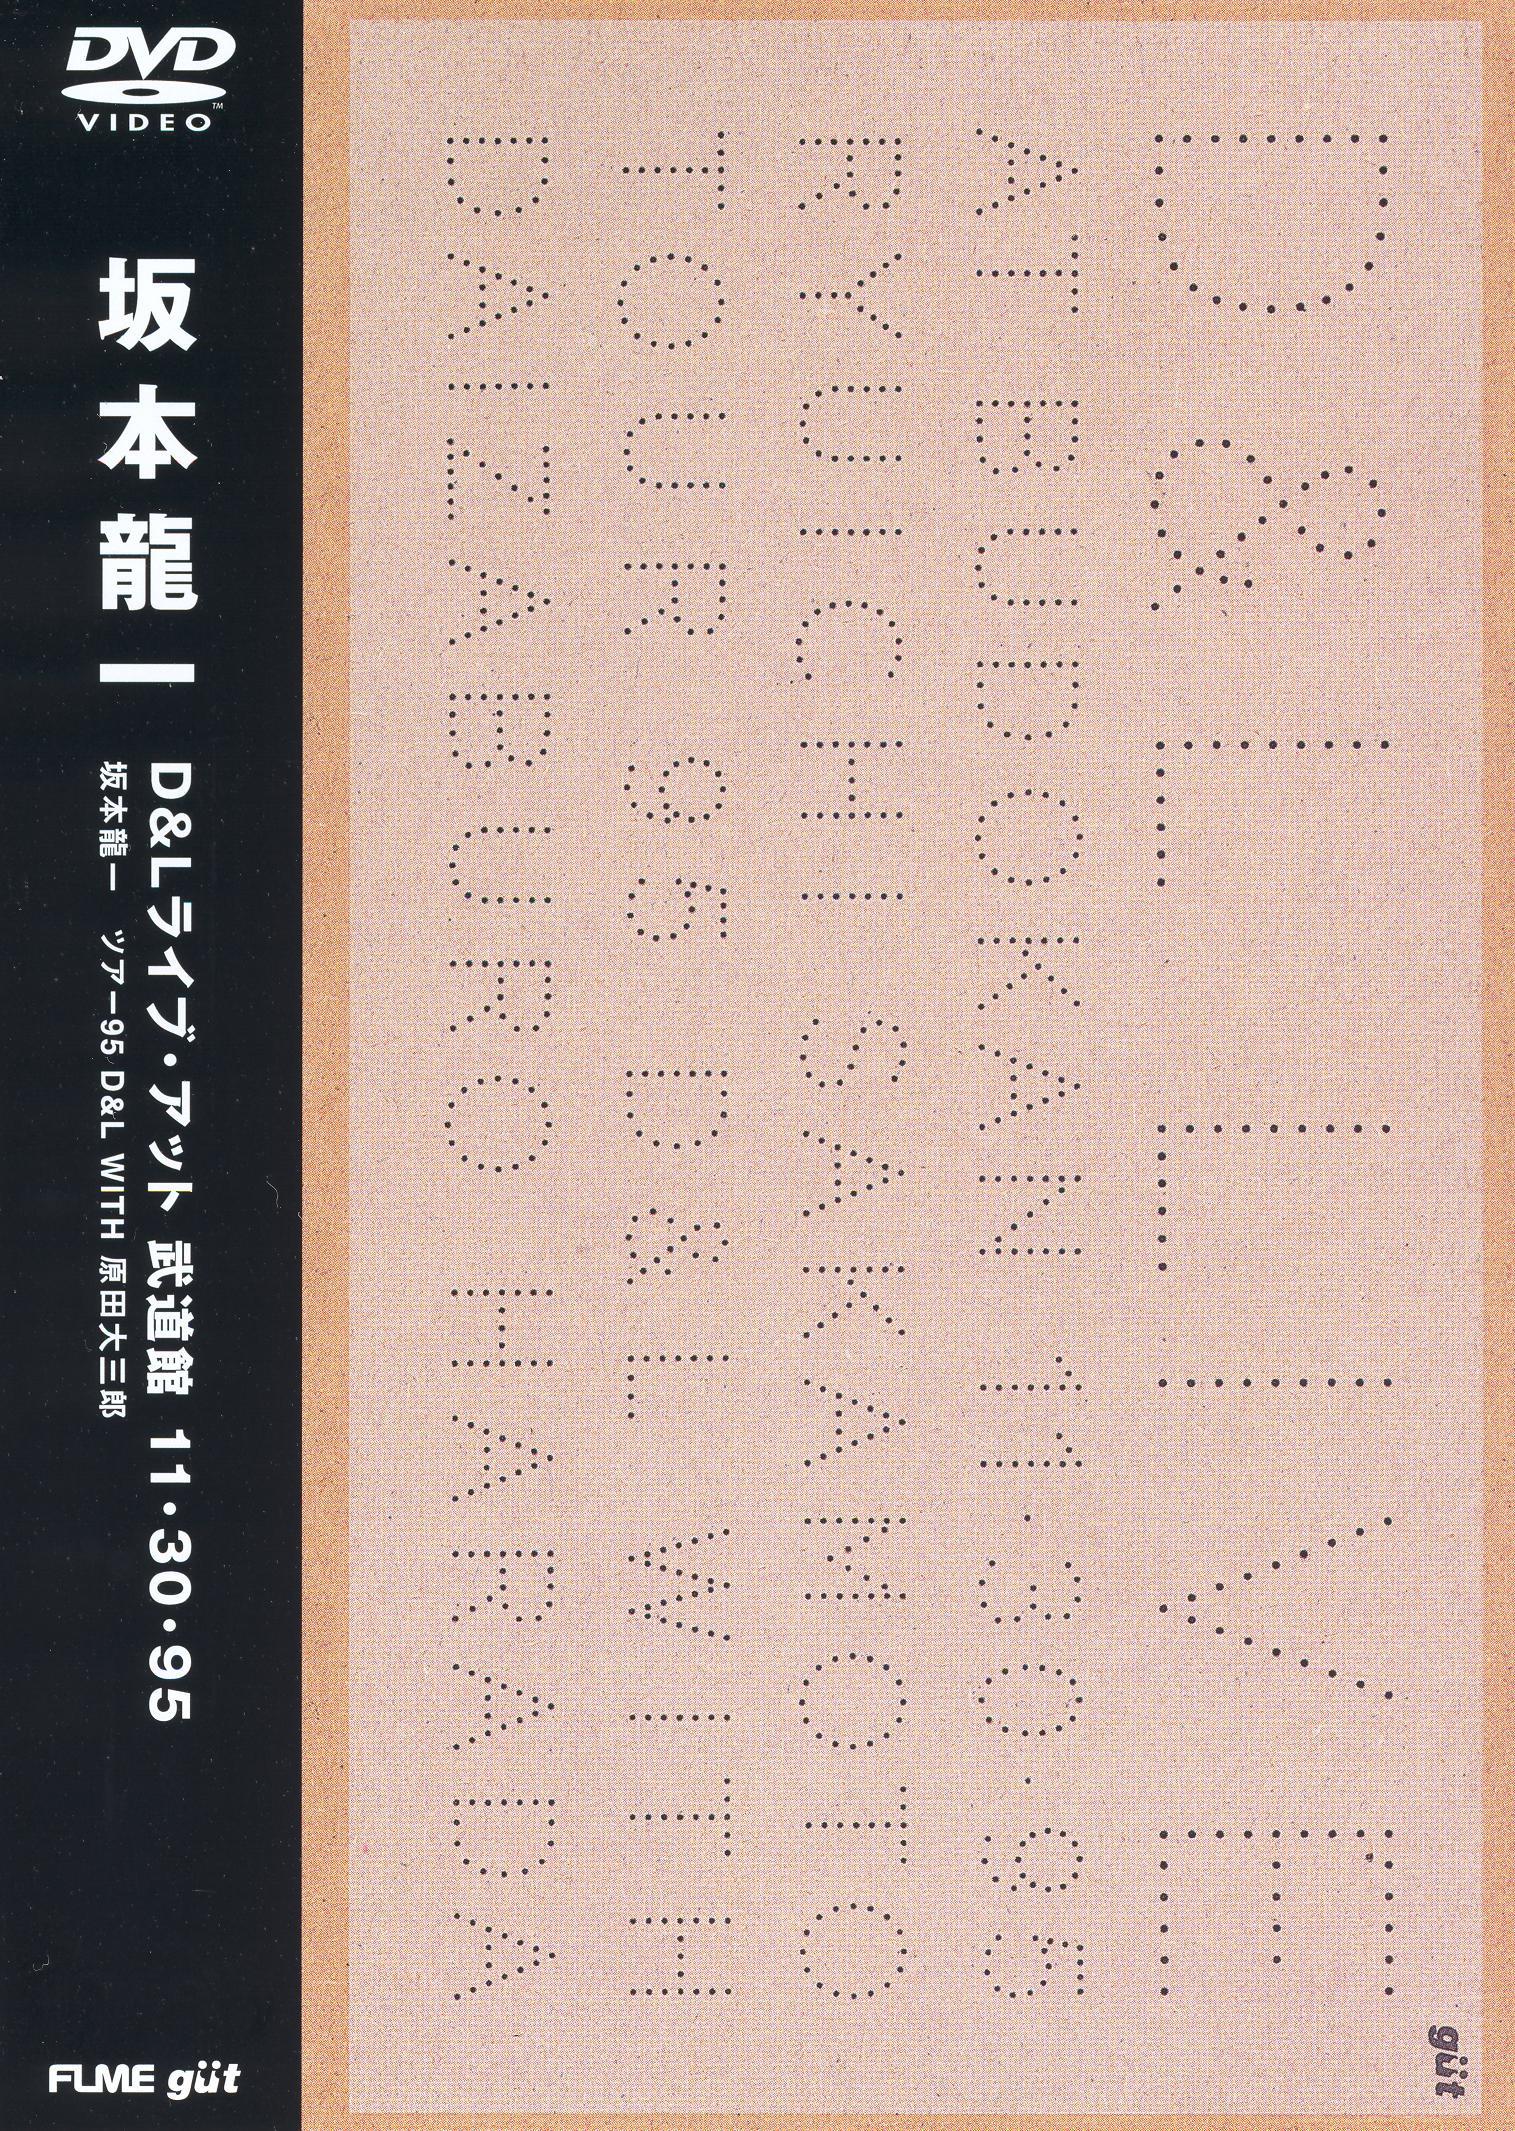 Ryuichi Sakamoto: D & L Live at Budokan, 11-30-95